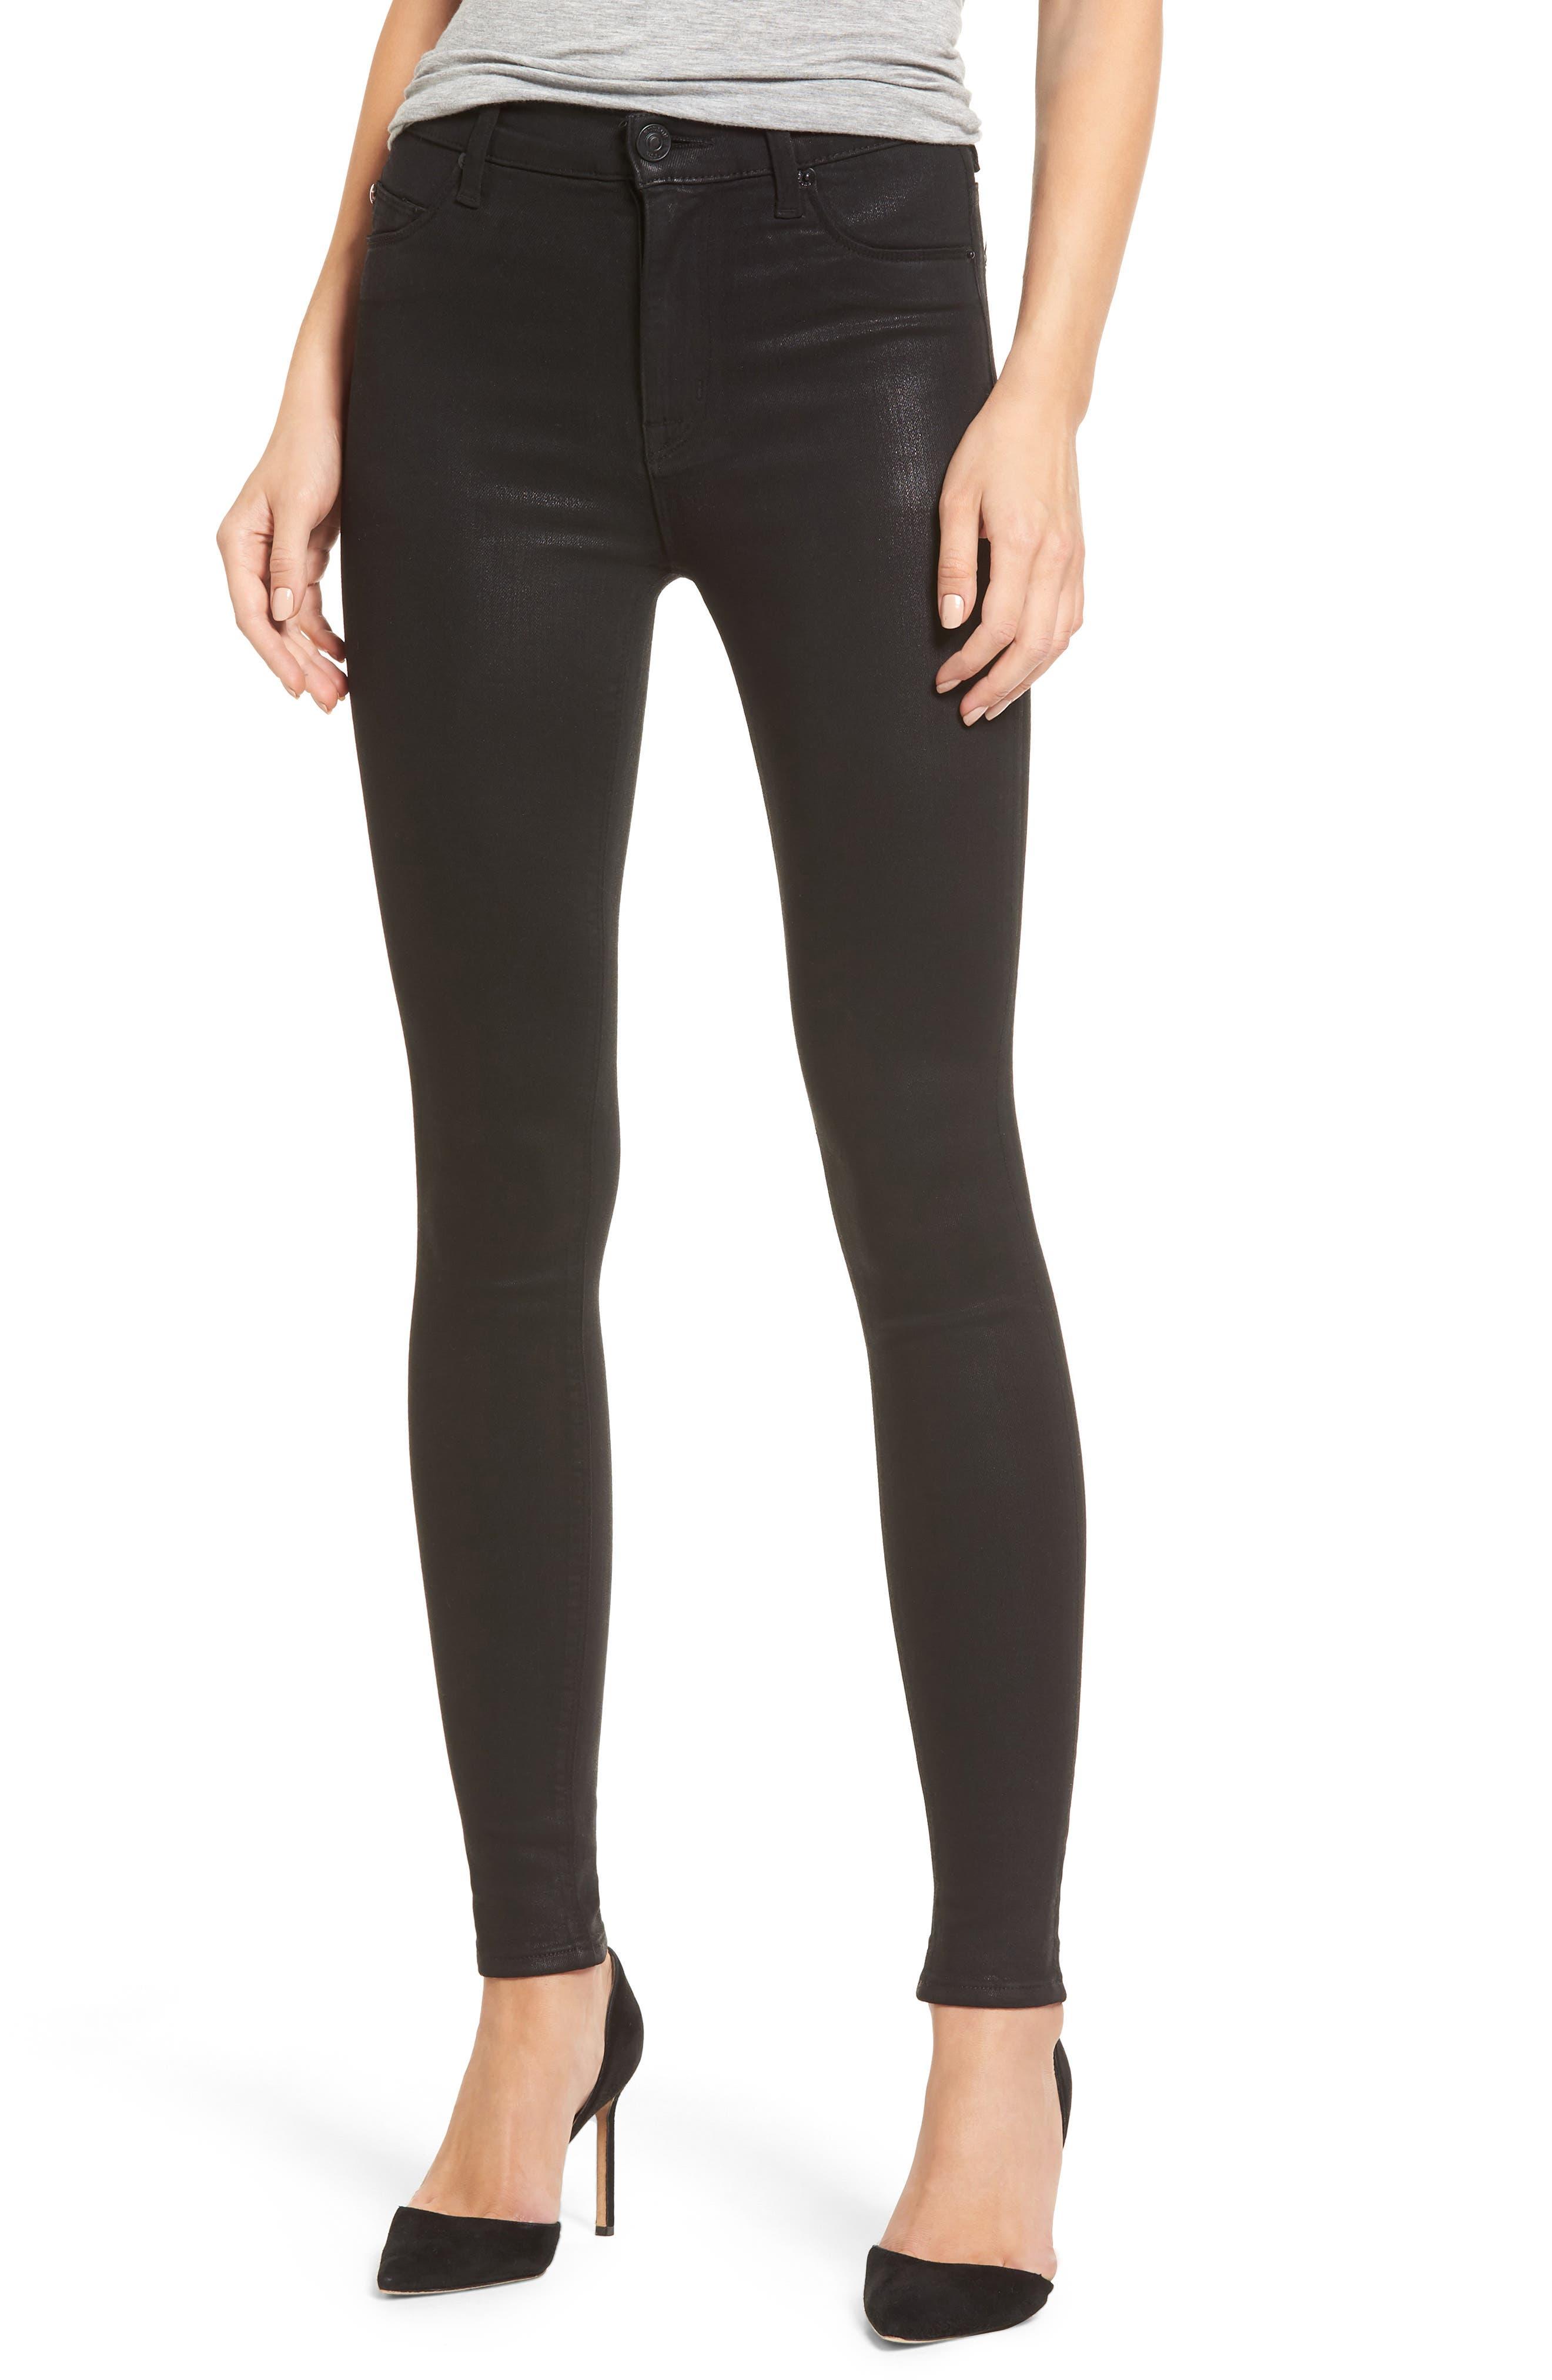 Barbara High Waist Skinny Jeans,                             Main thumbnail 1, color,                             Noir Coated